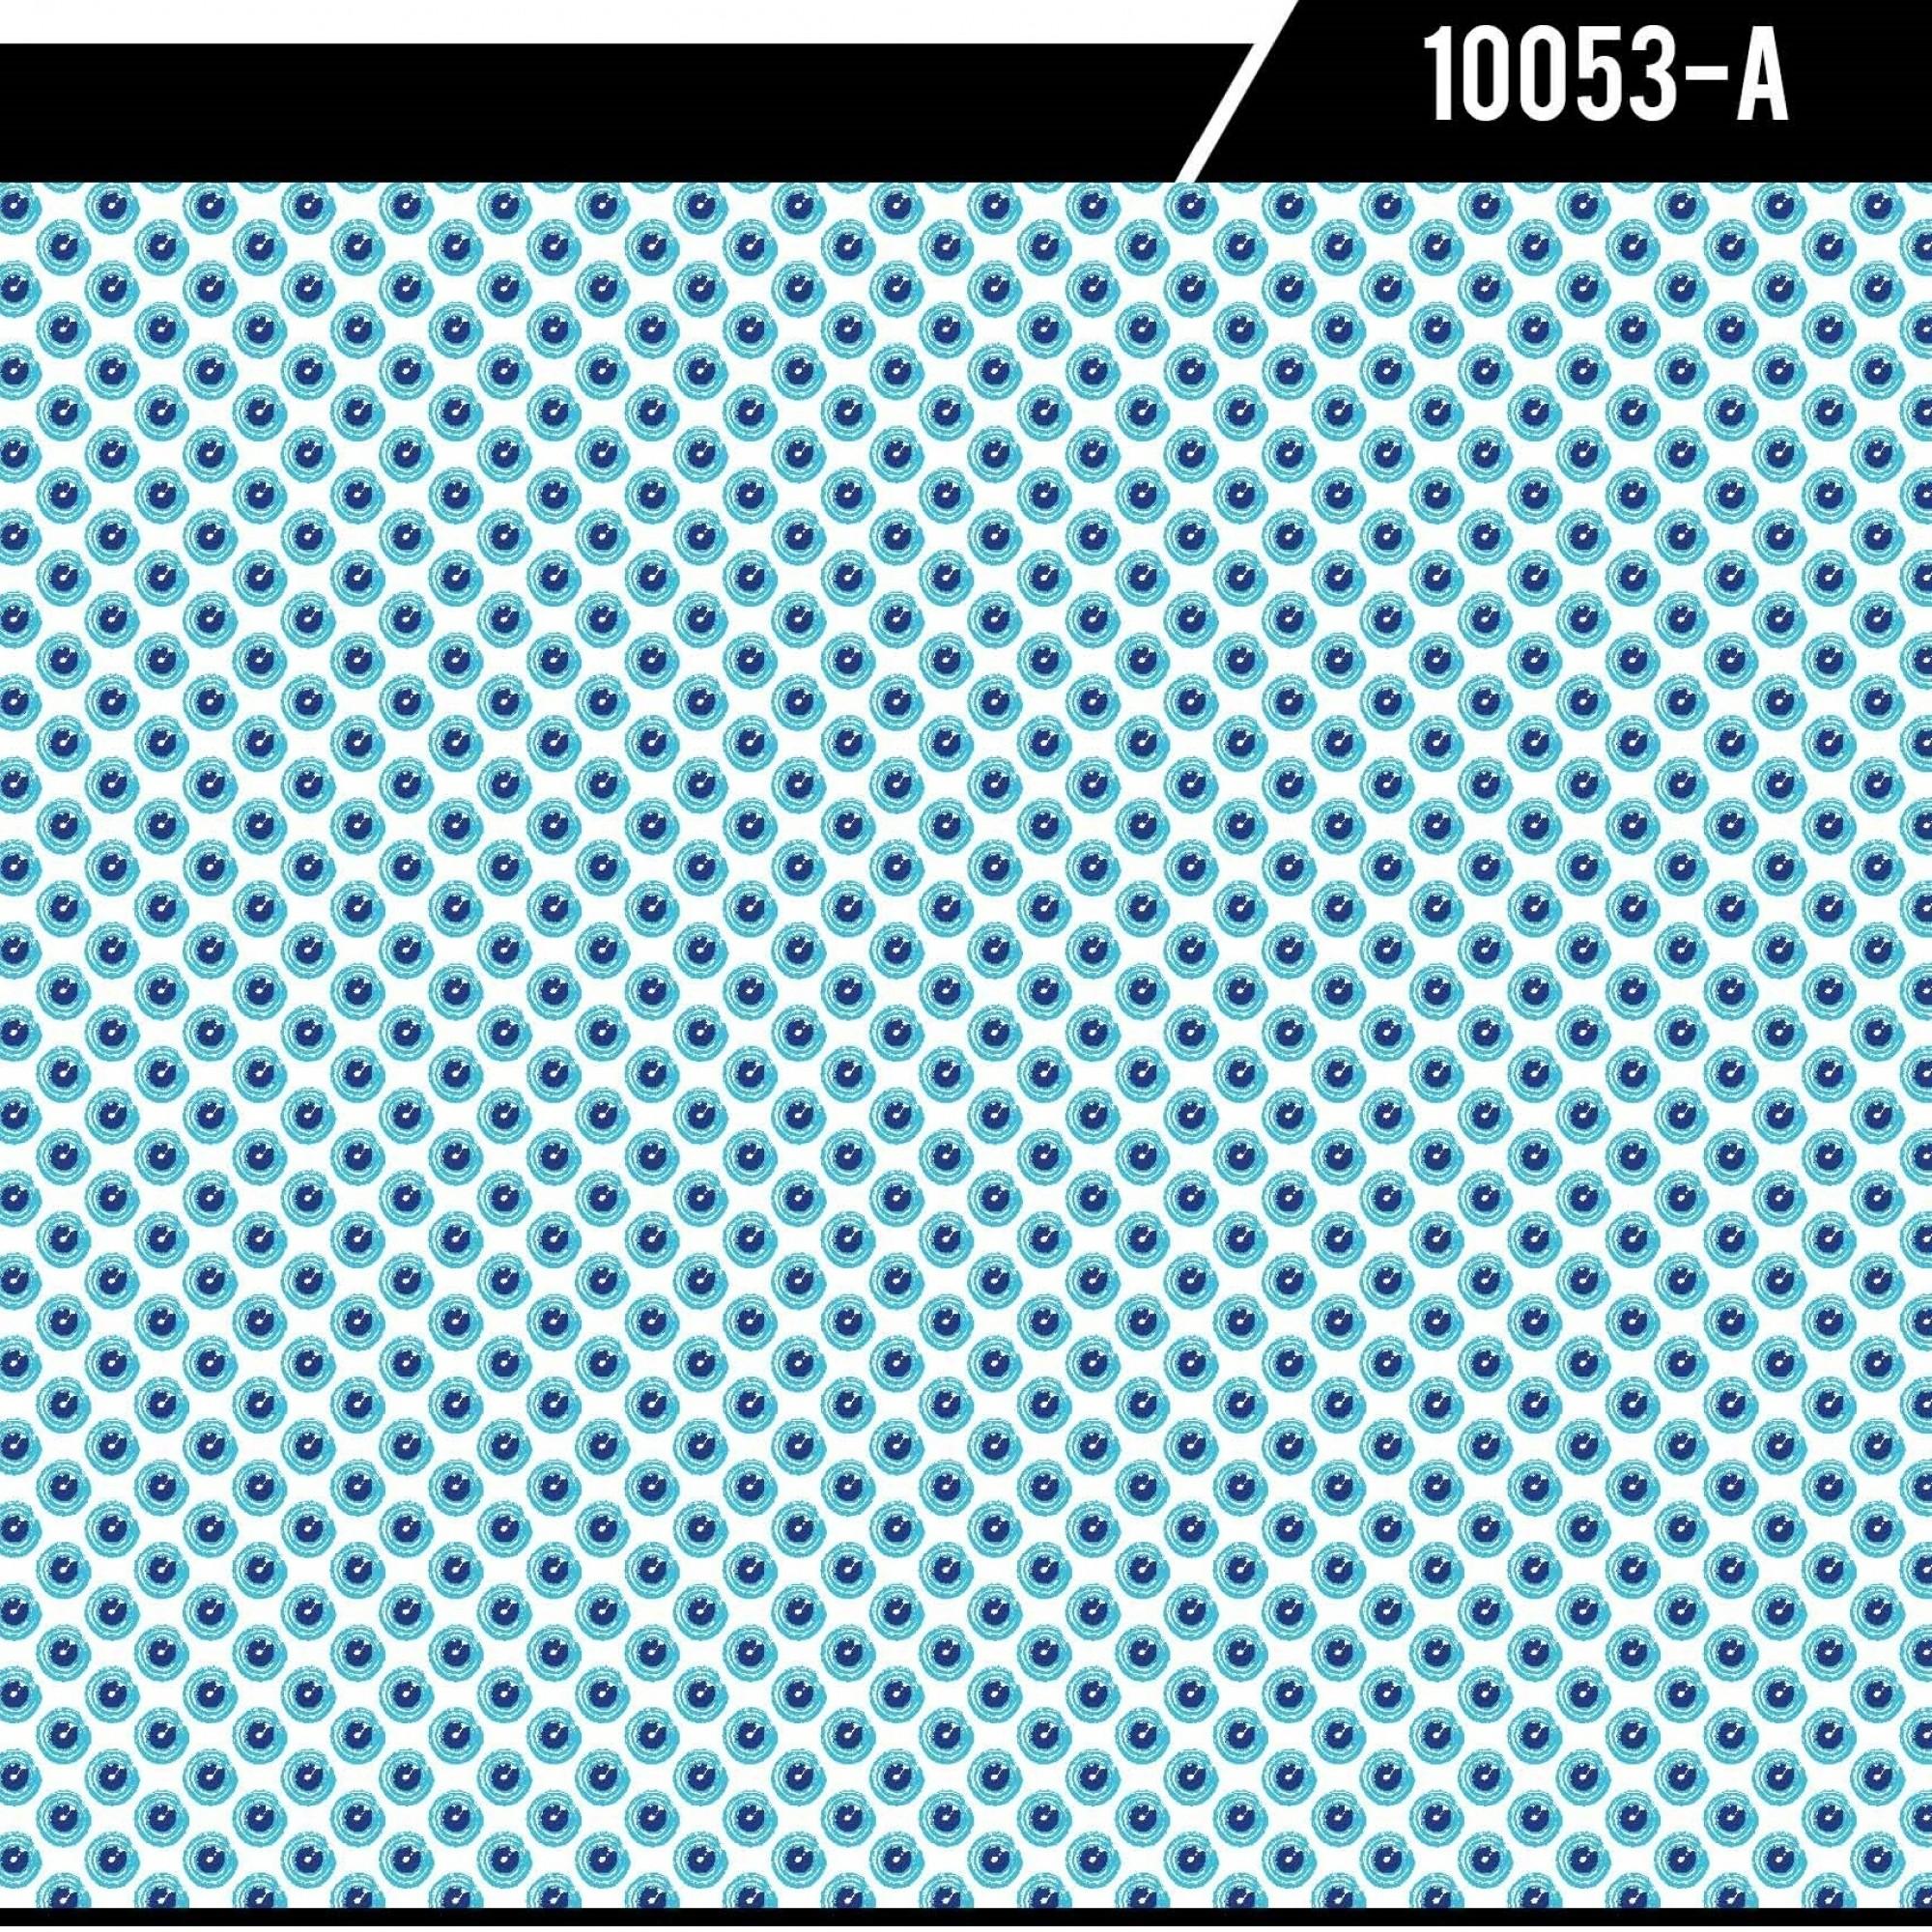 10053